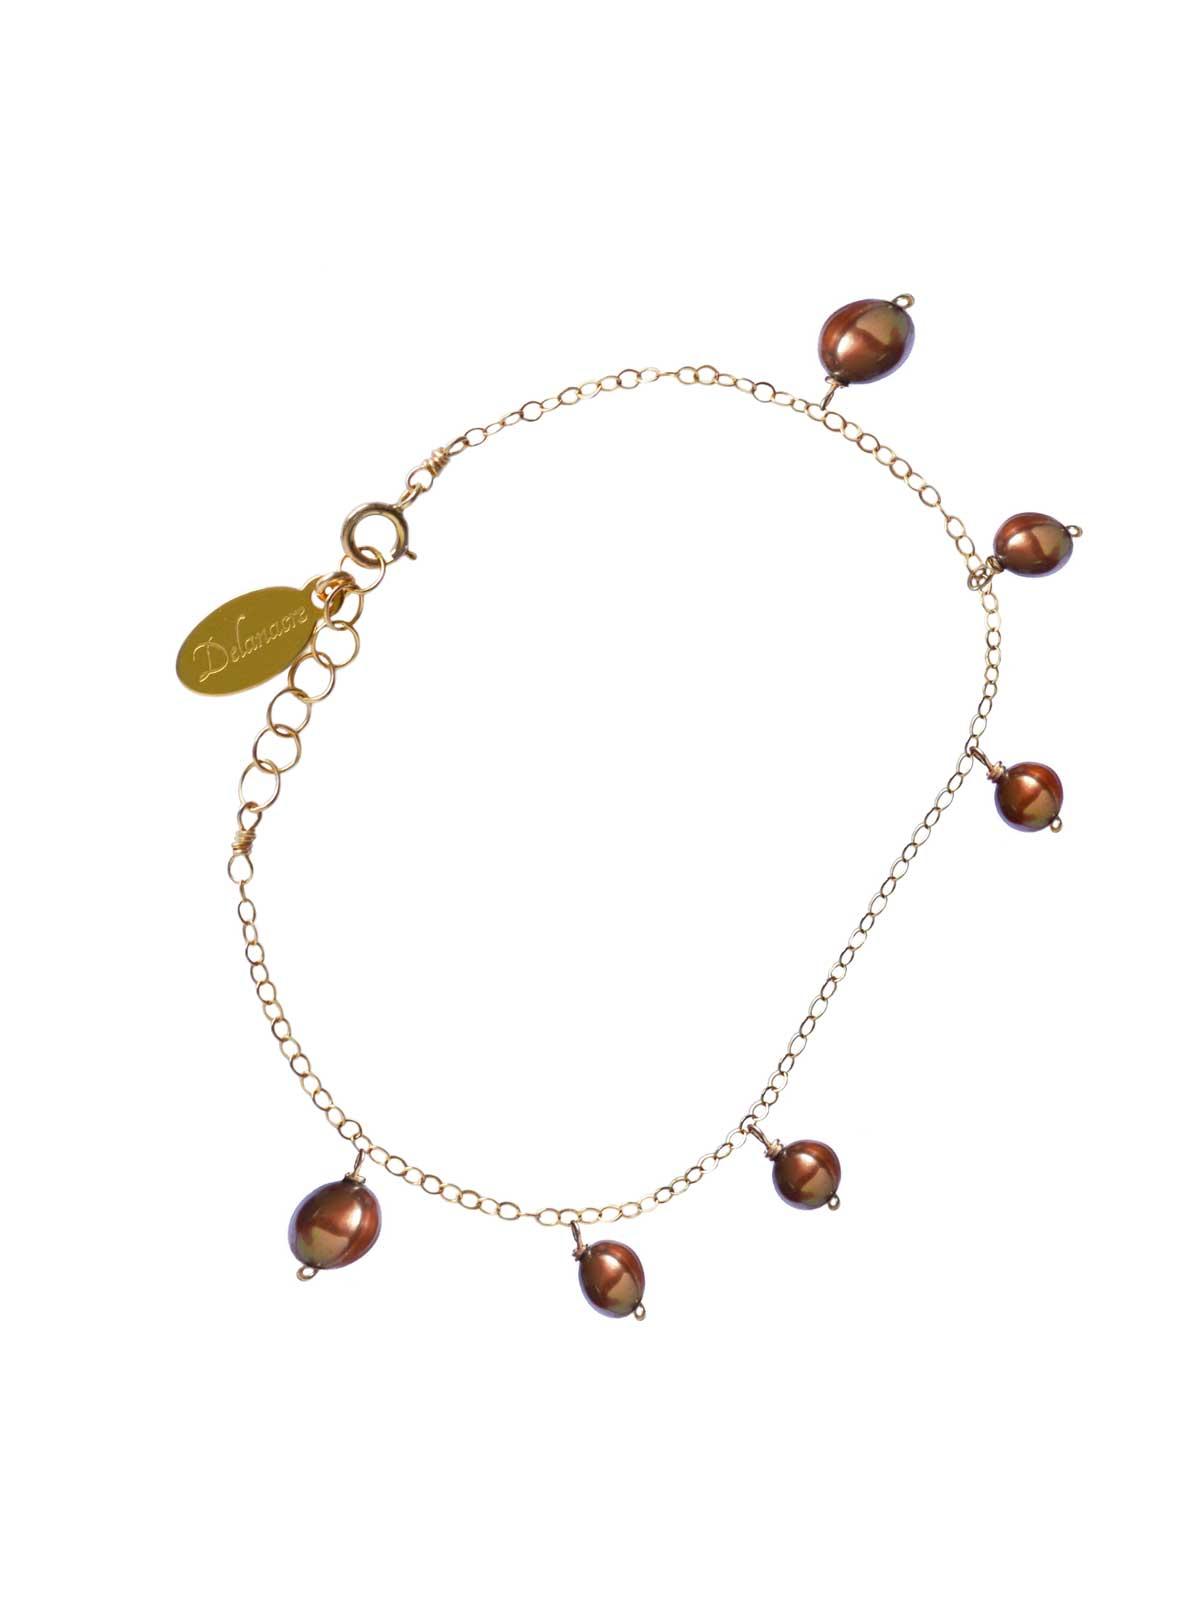 Bracelet 14K Gold-filled chain GOLDEN PEARL